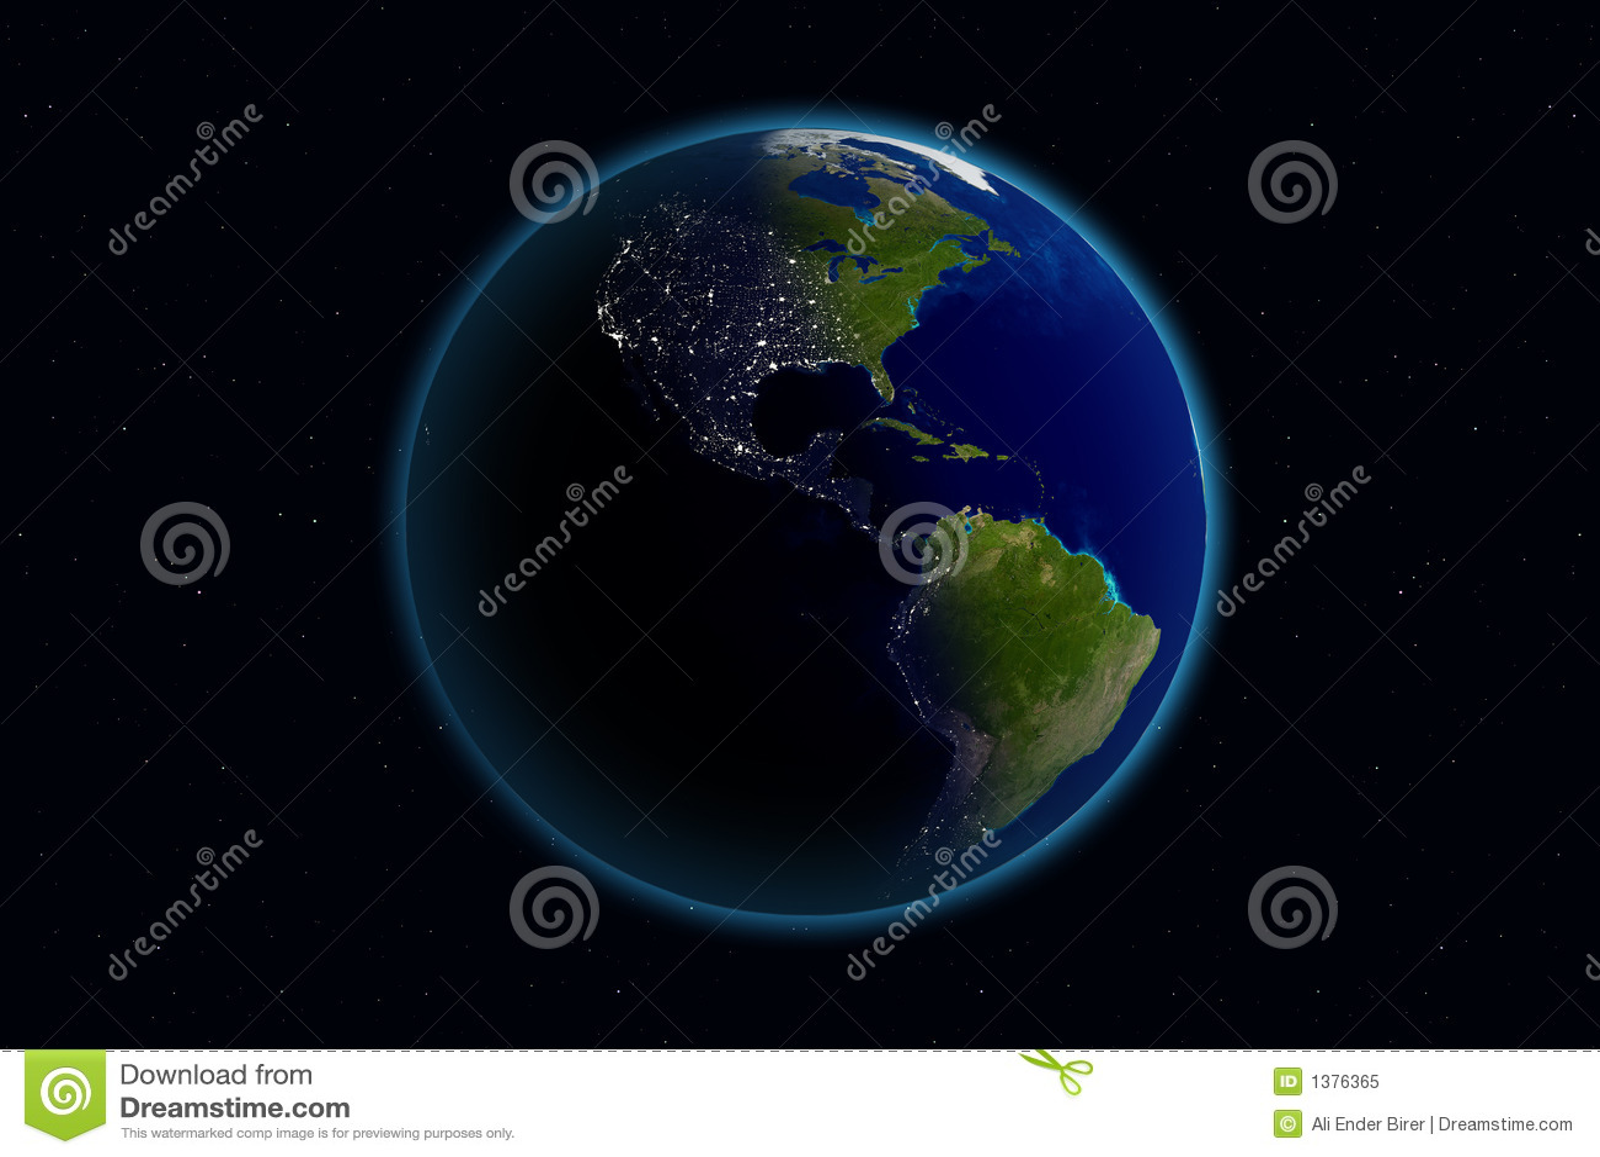 Earth - Day & Night - America